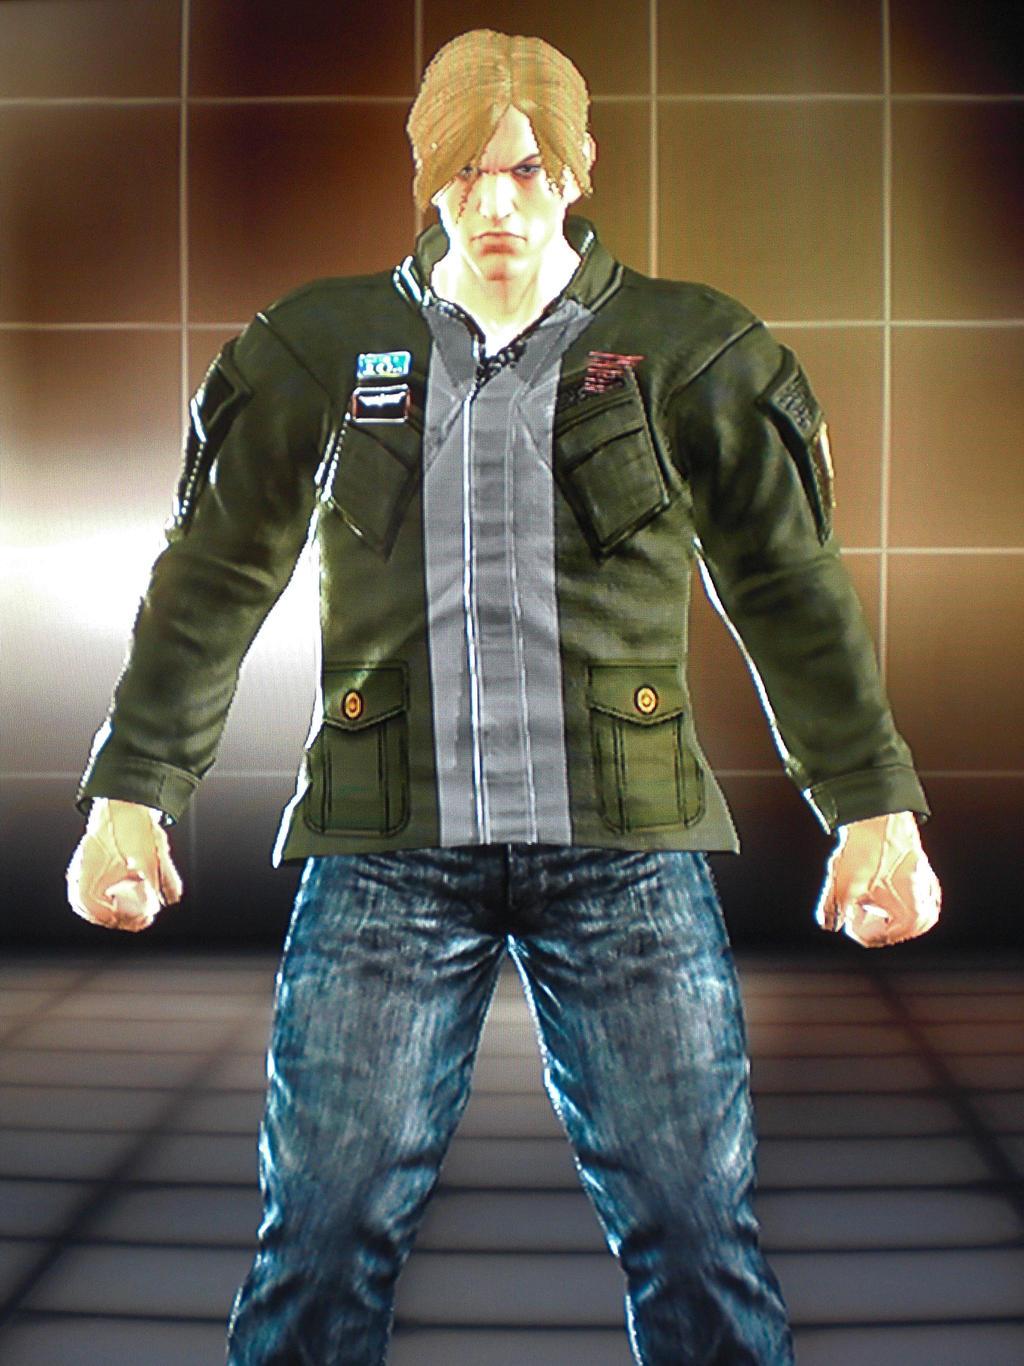 Tekken Tt2 James Sunderland Silent Hill 2 By Potetprofet On